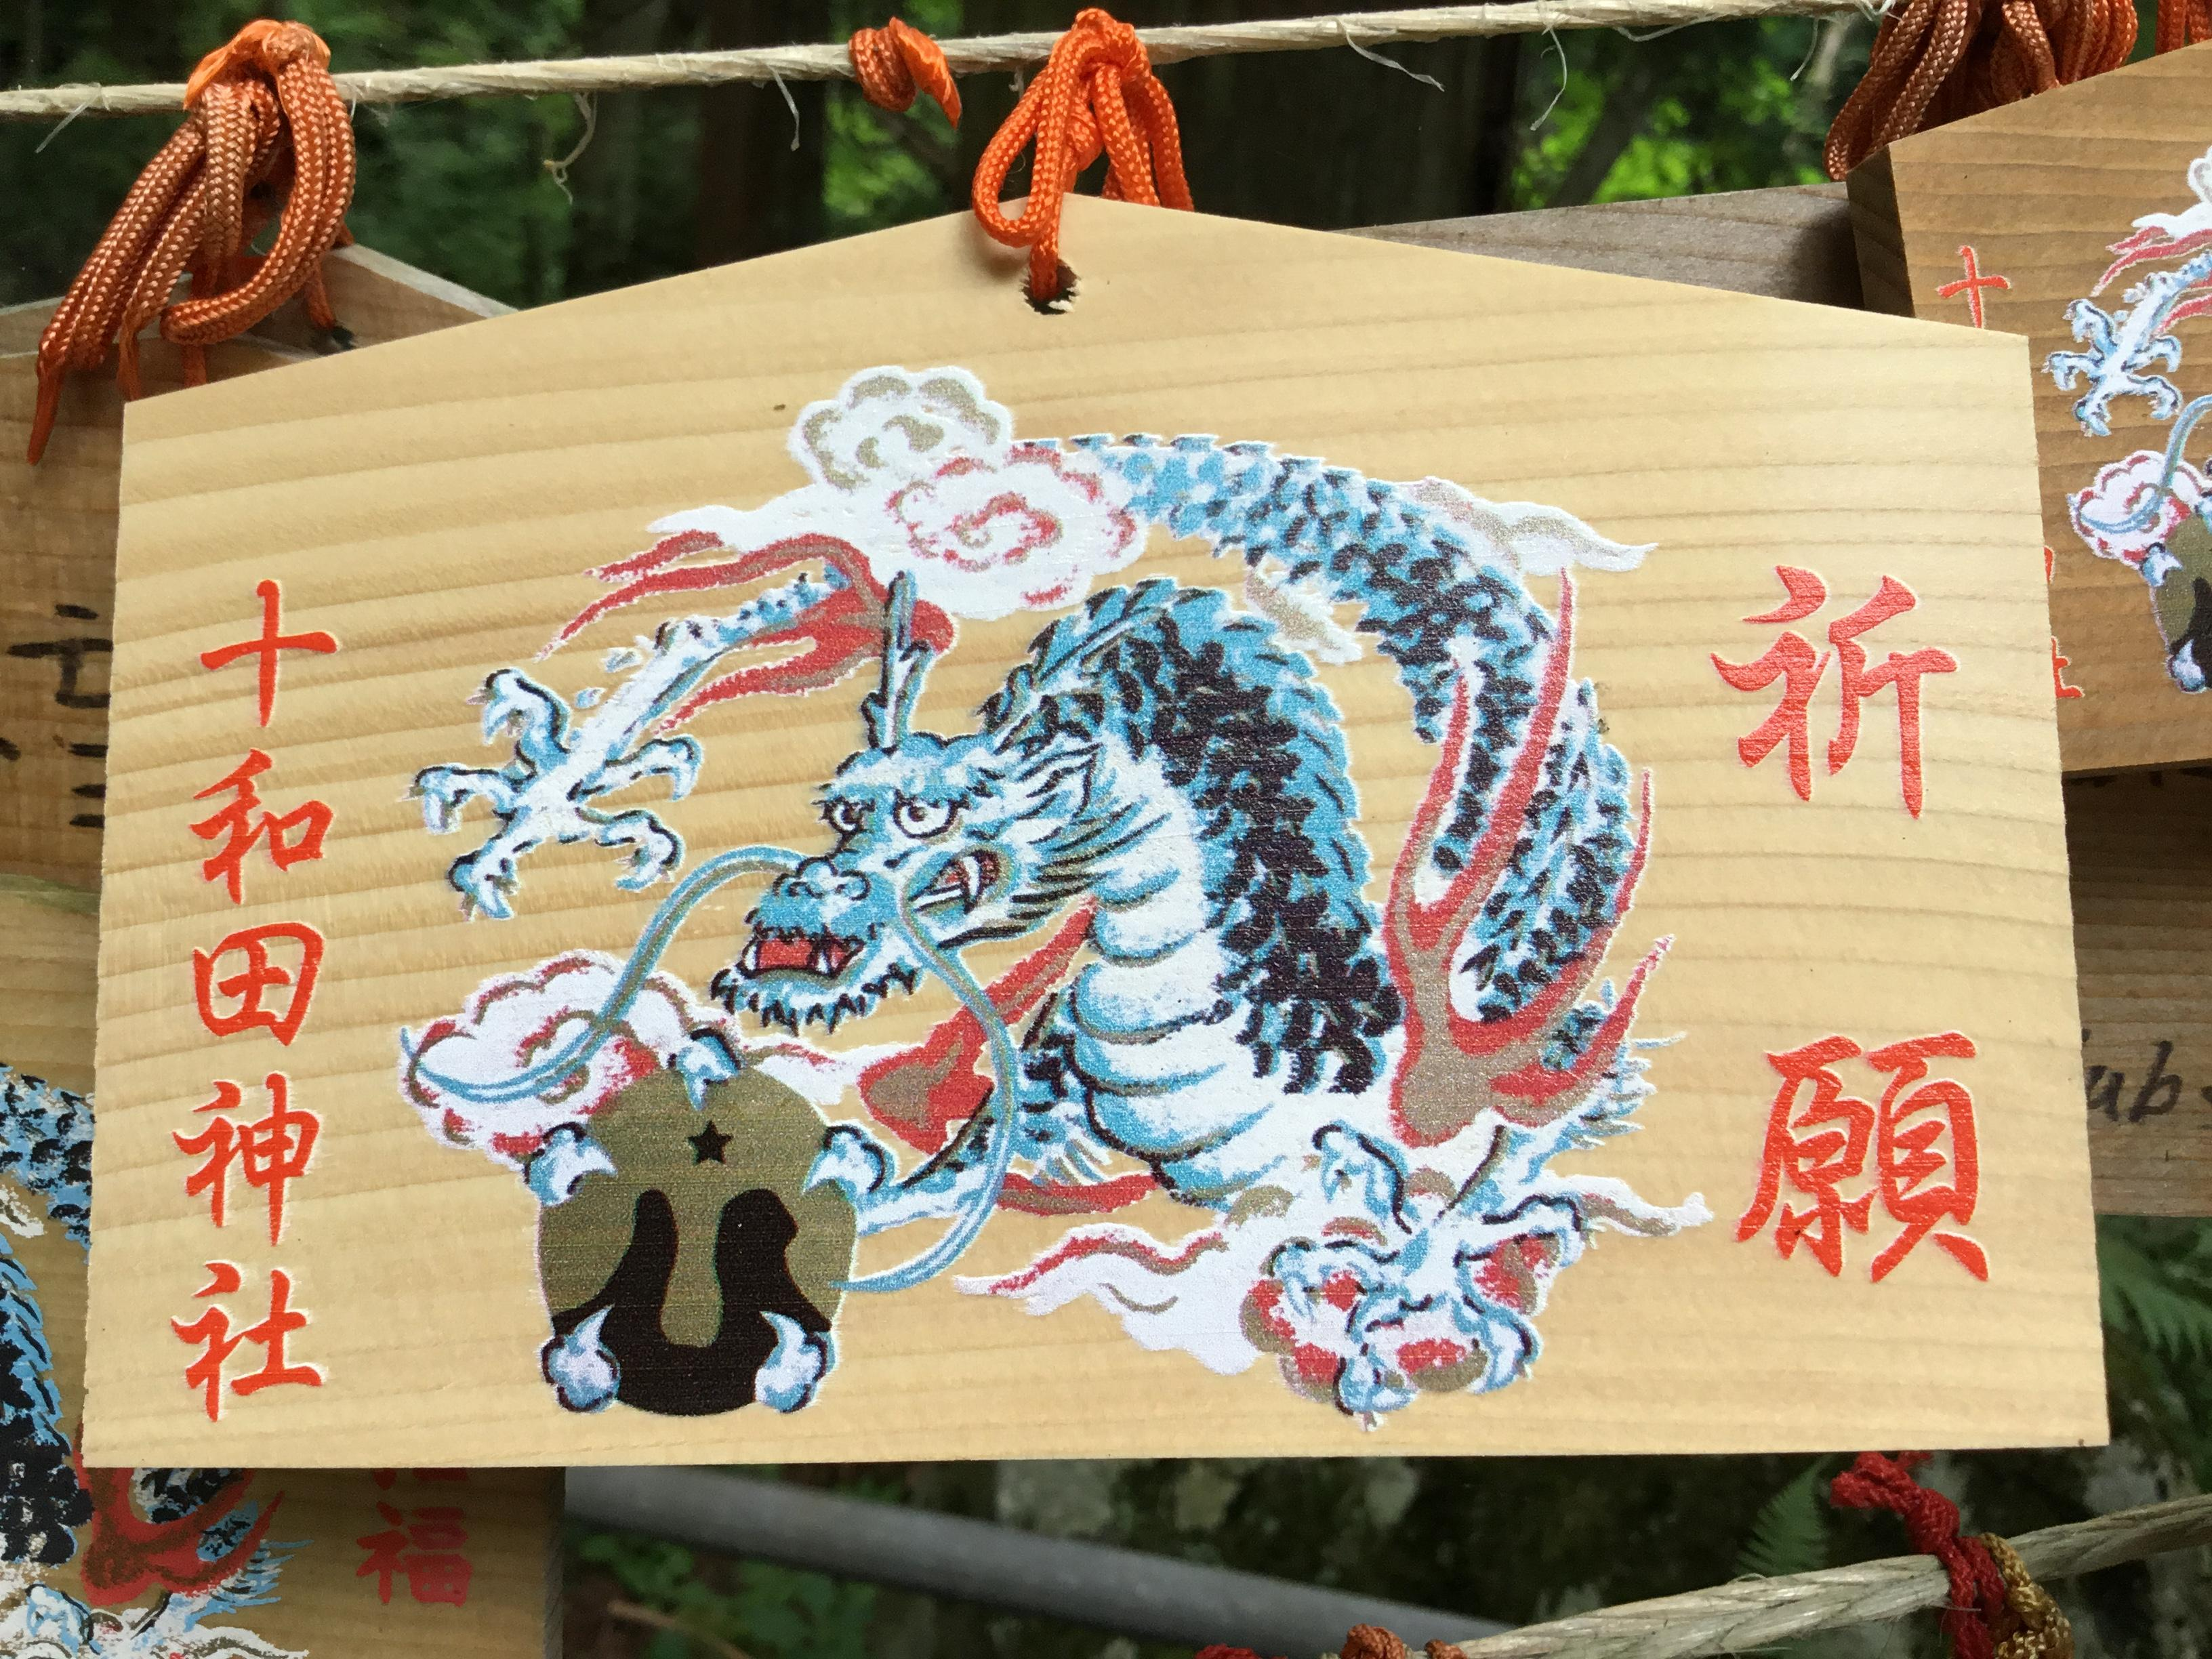 十和田神社の絵馬